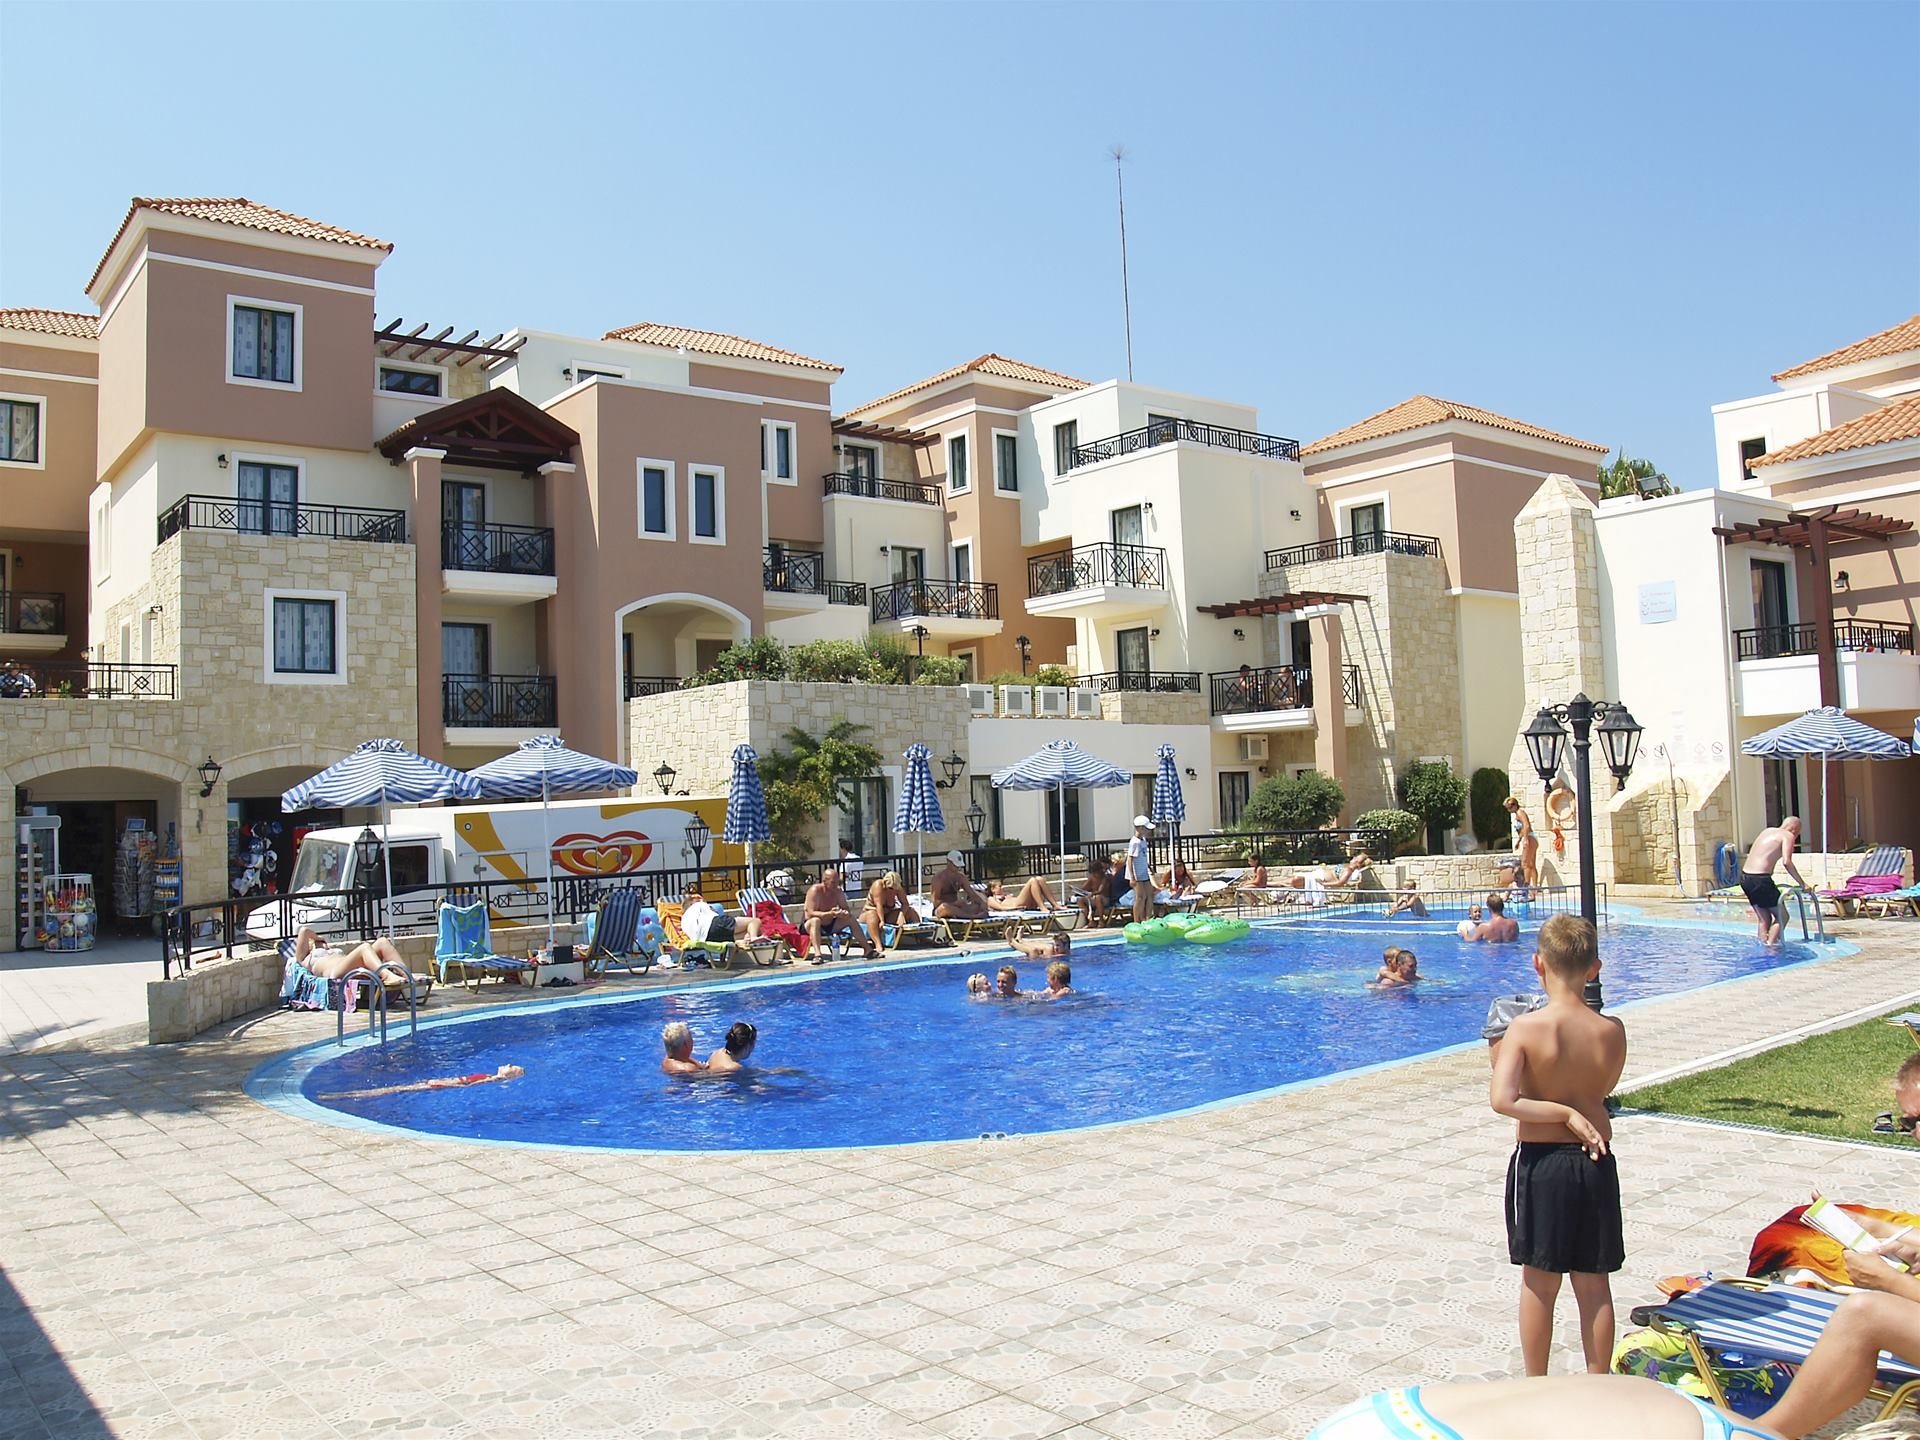 Pool fun with oasis jamie amp april - 2 2